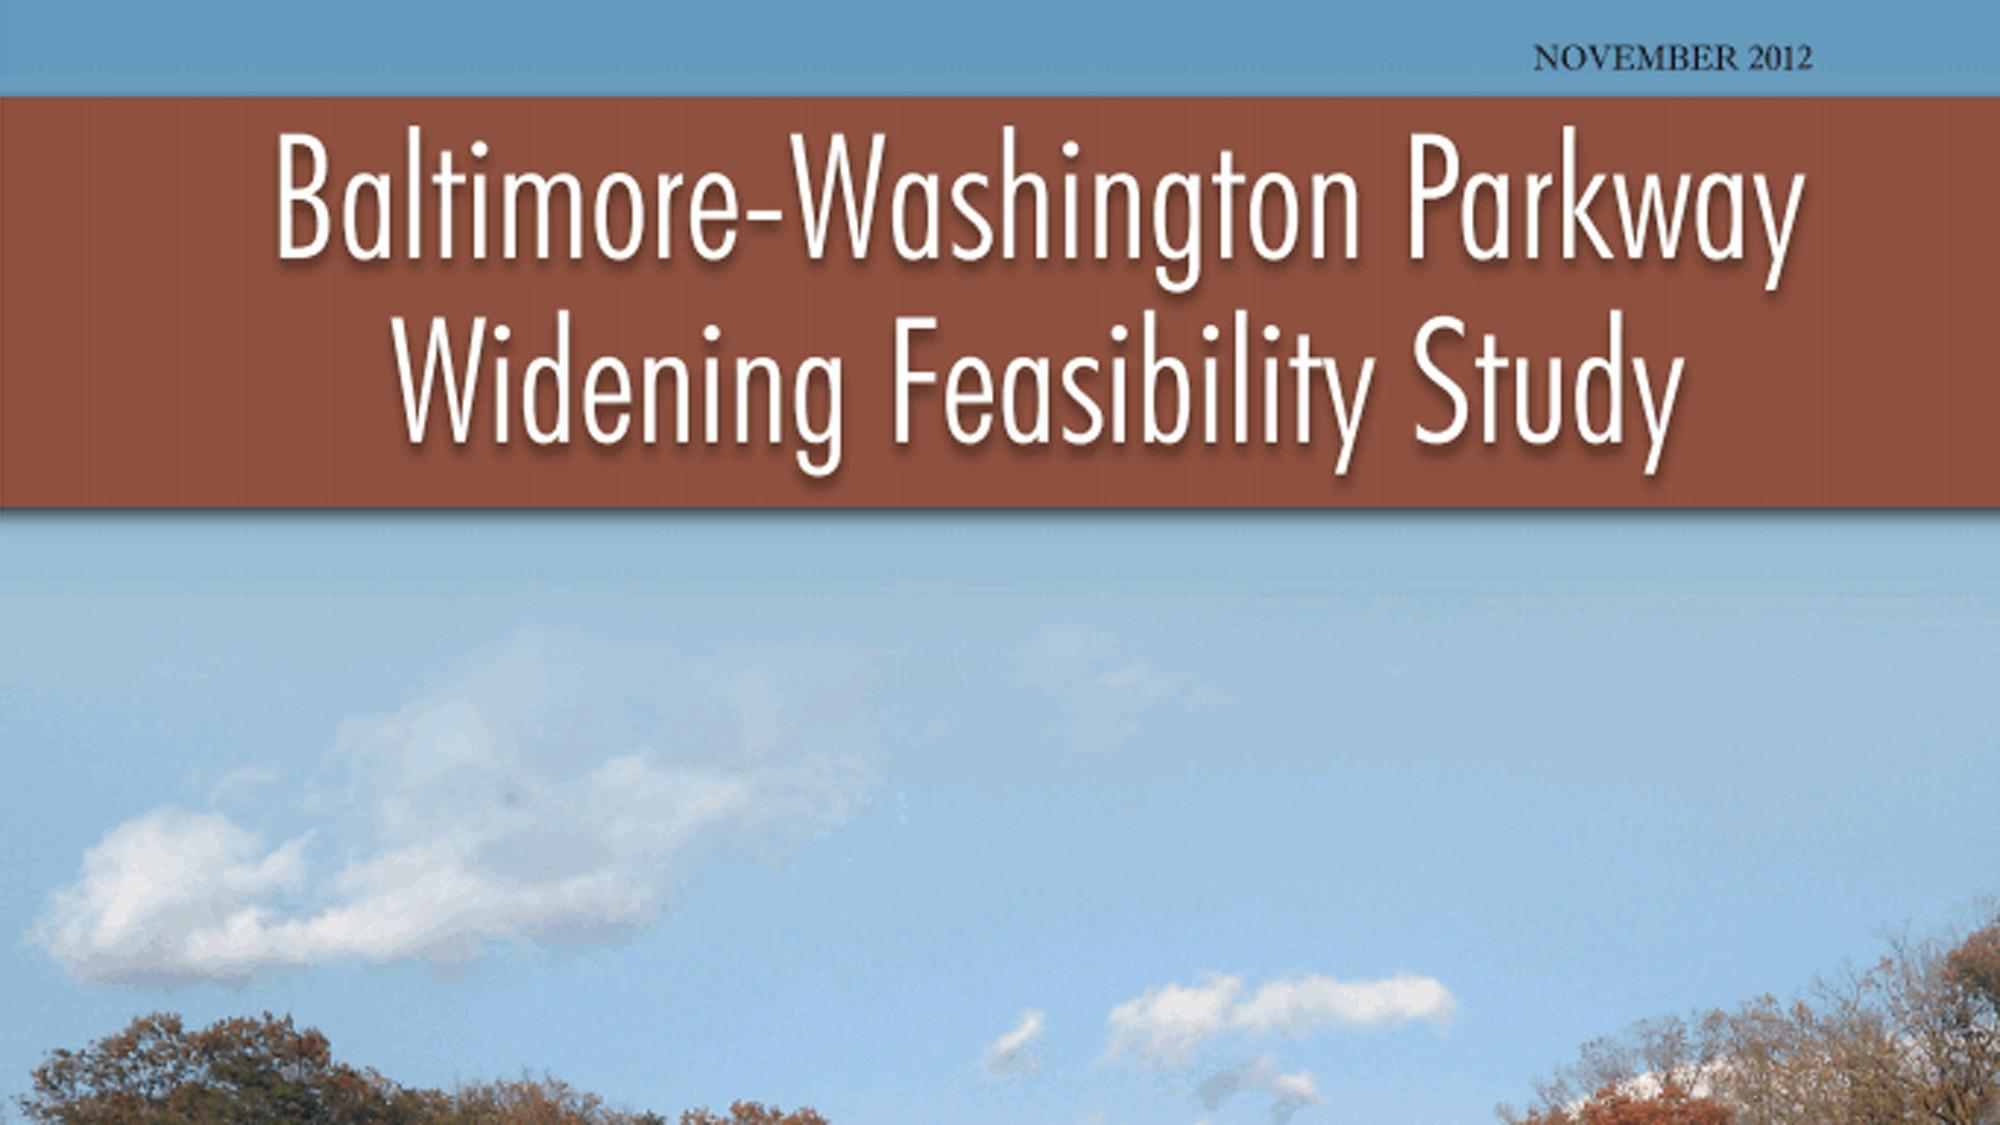 amusement park feasibility study pdf